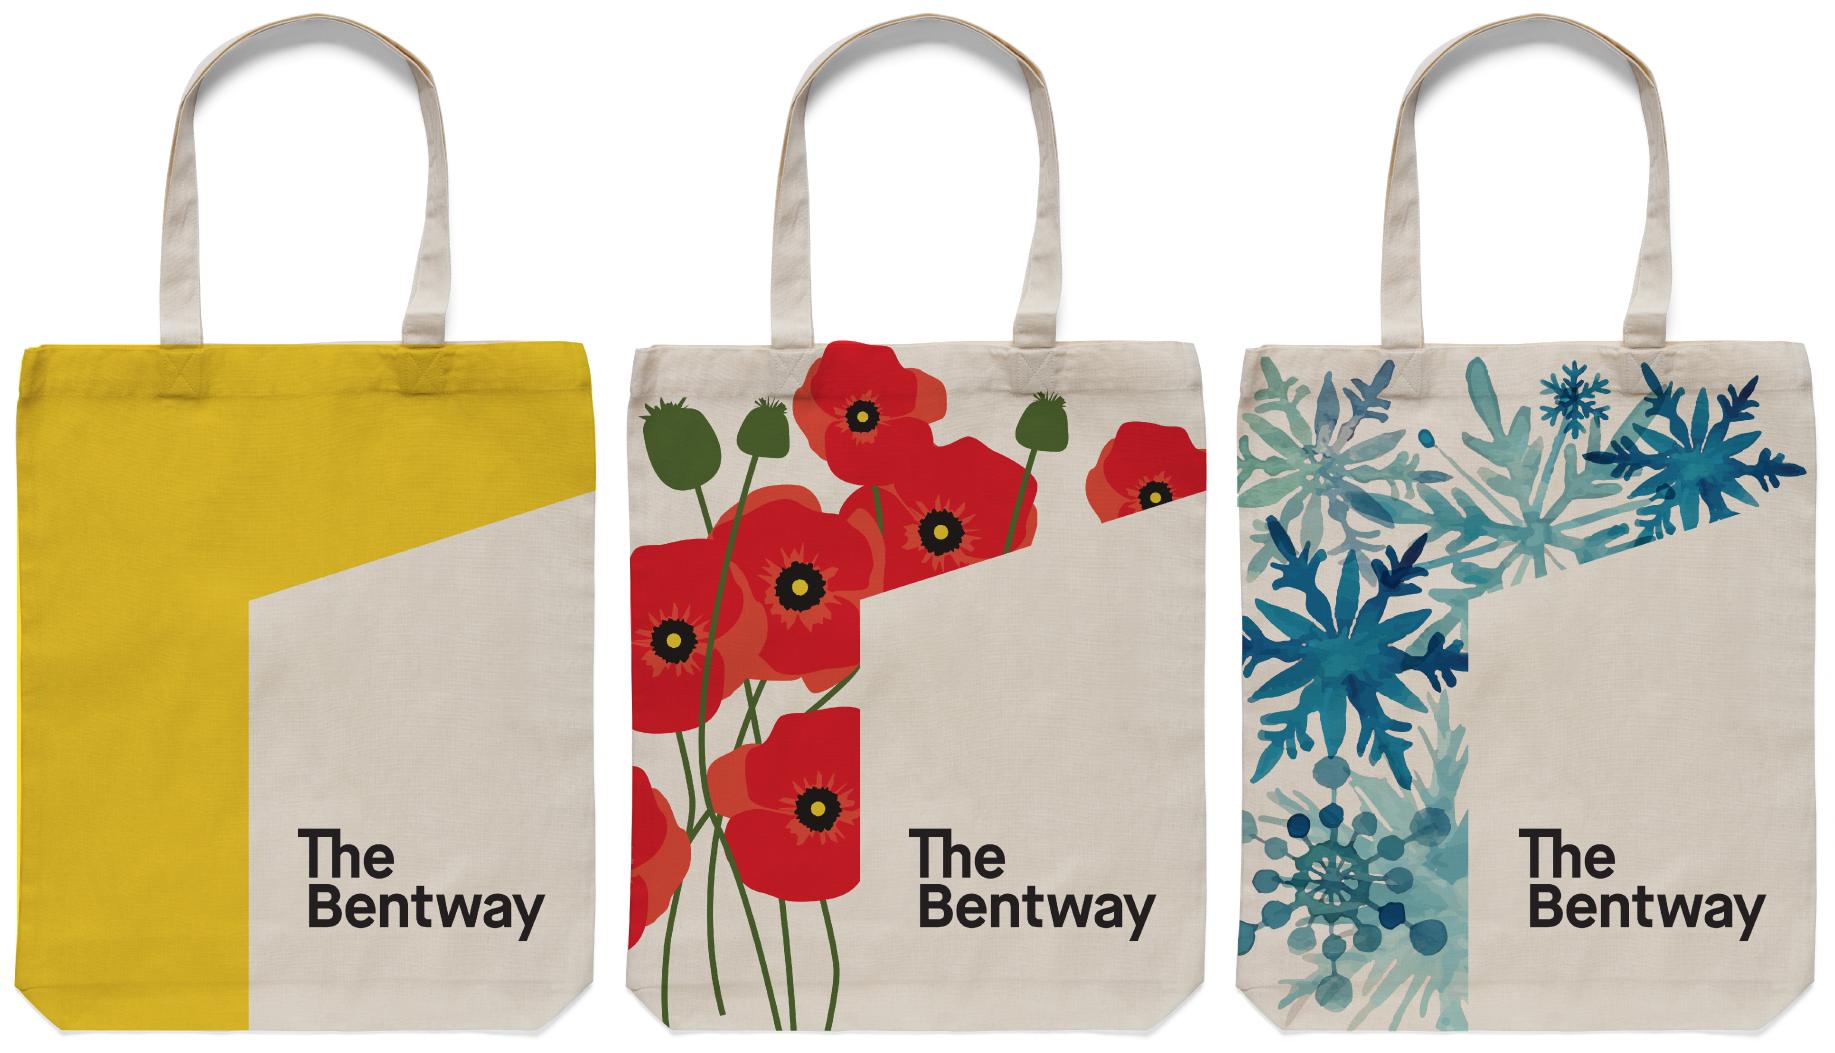 Mock-up of Bentway branded tote bags